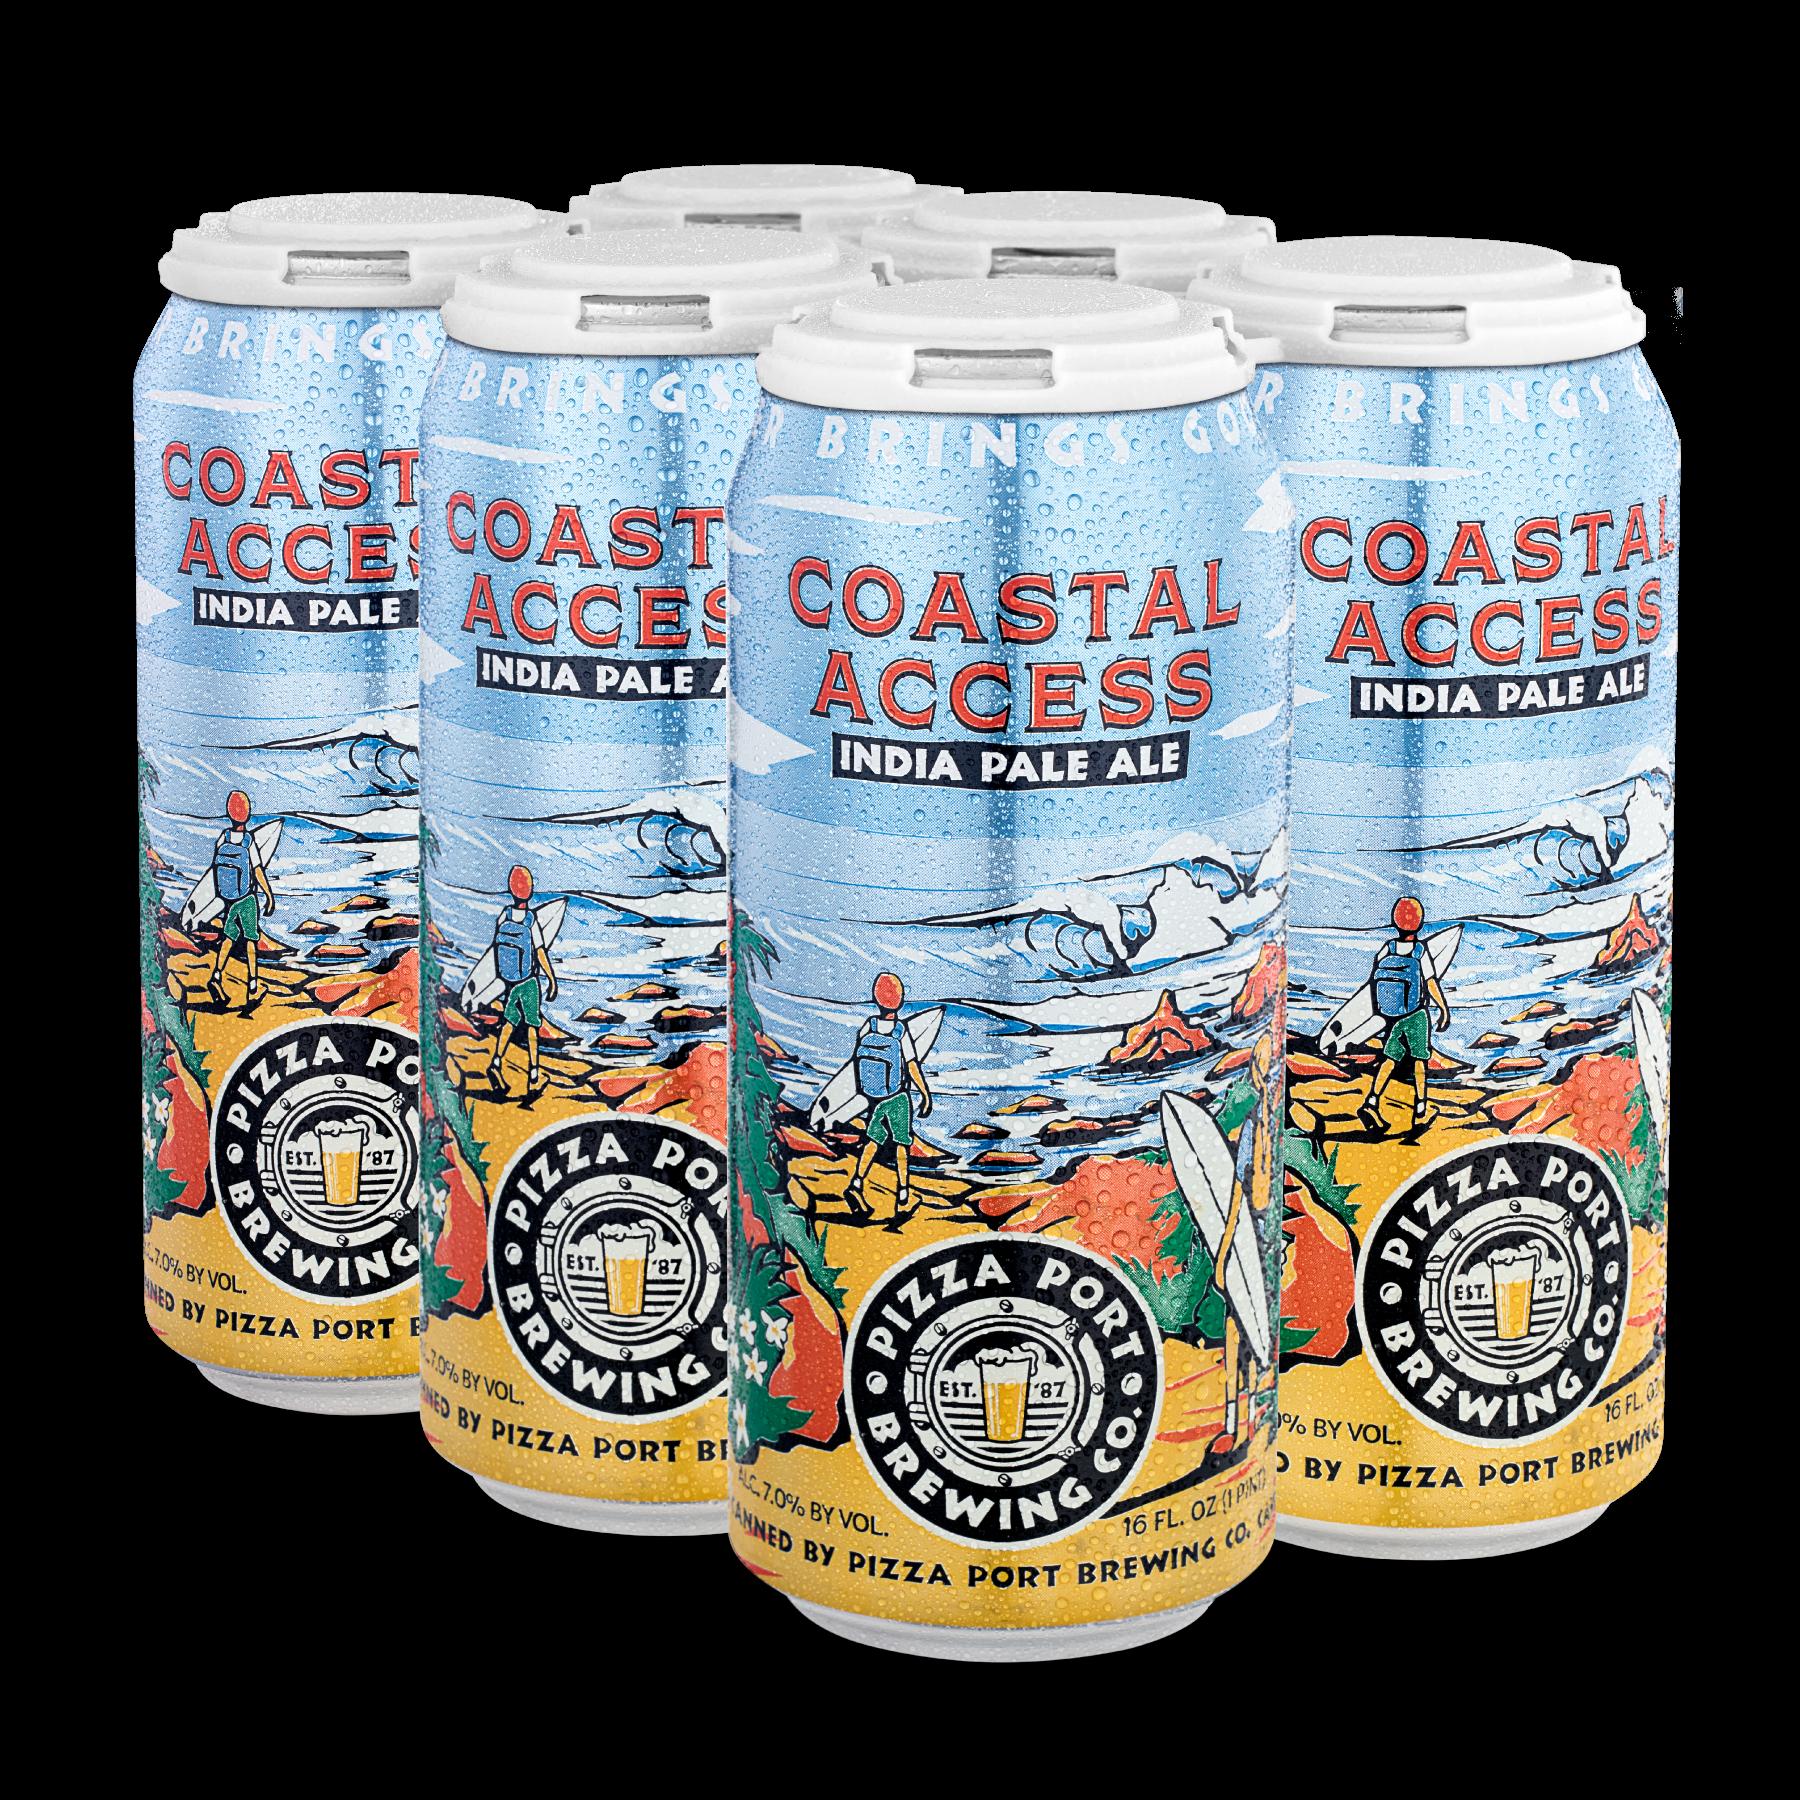 Coastal Access Packaging